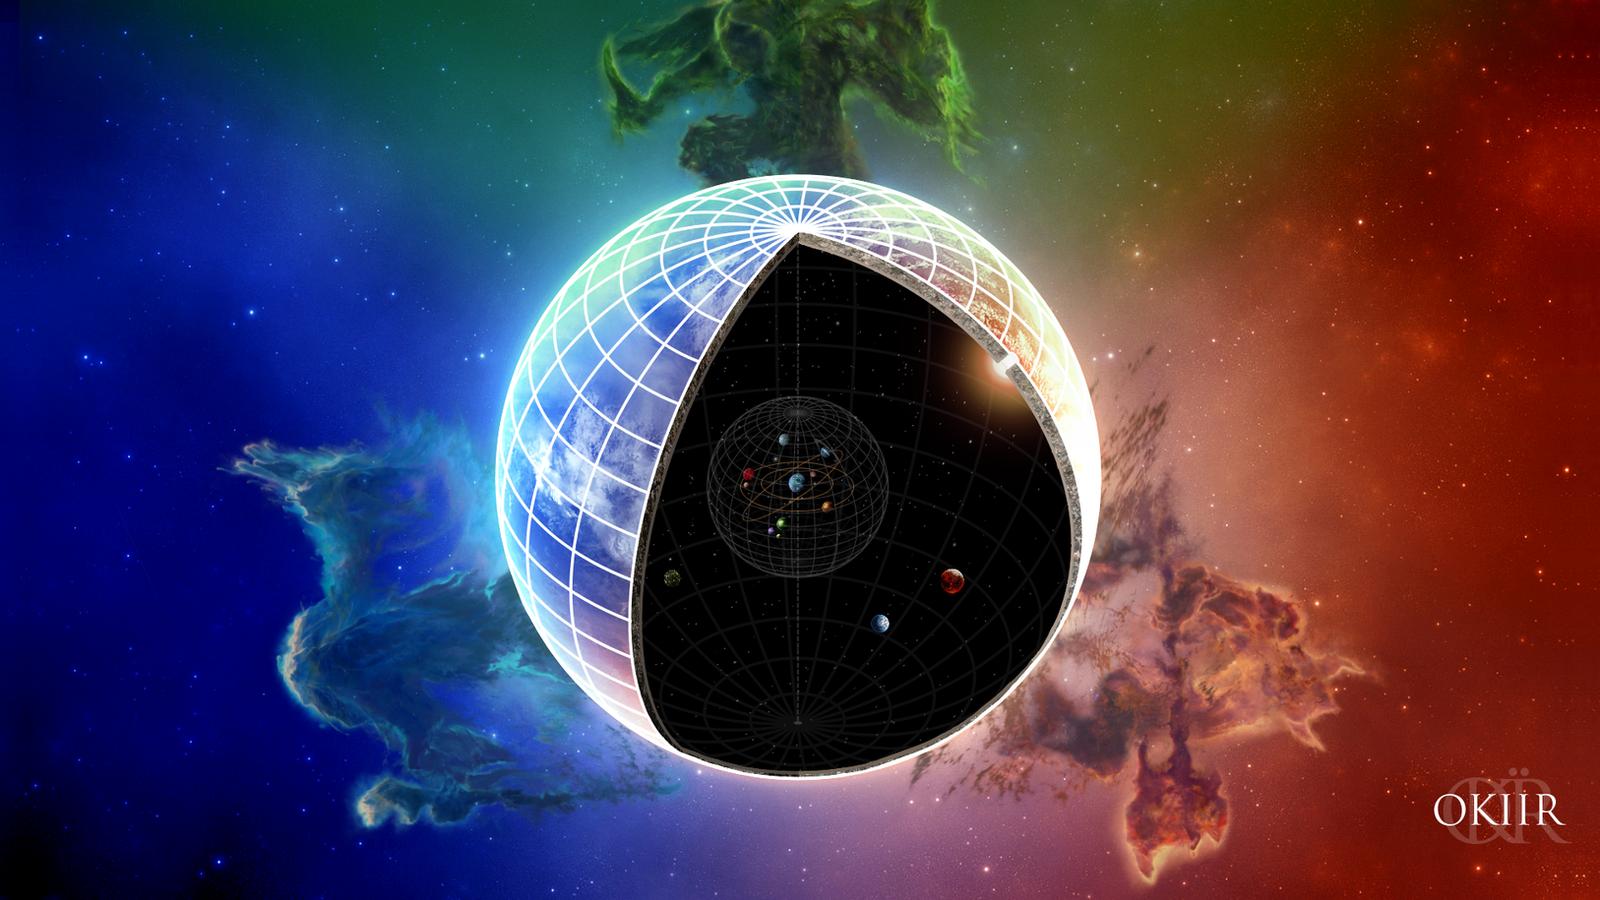 The Elder Scrolls: Cosmology Wallpaper by okiir